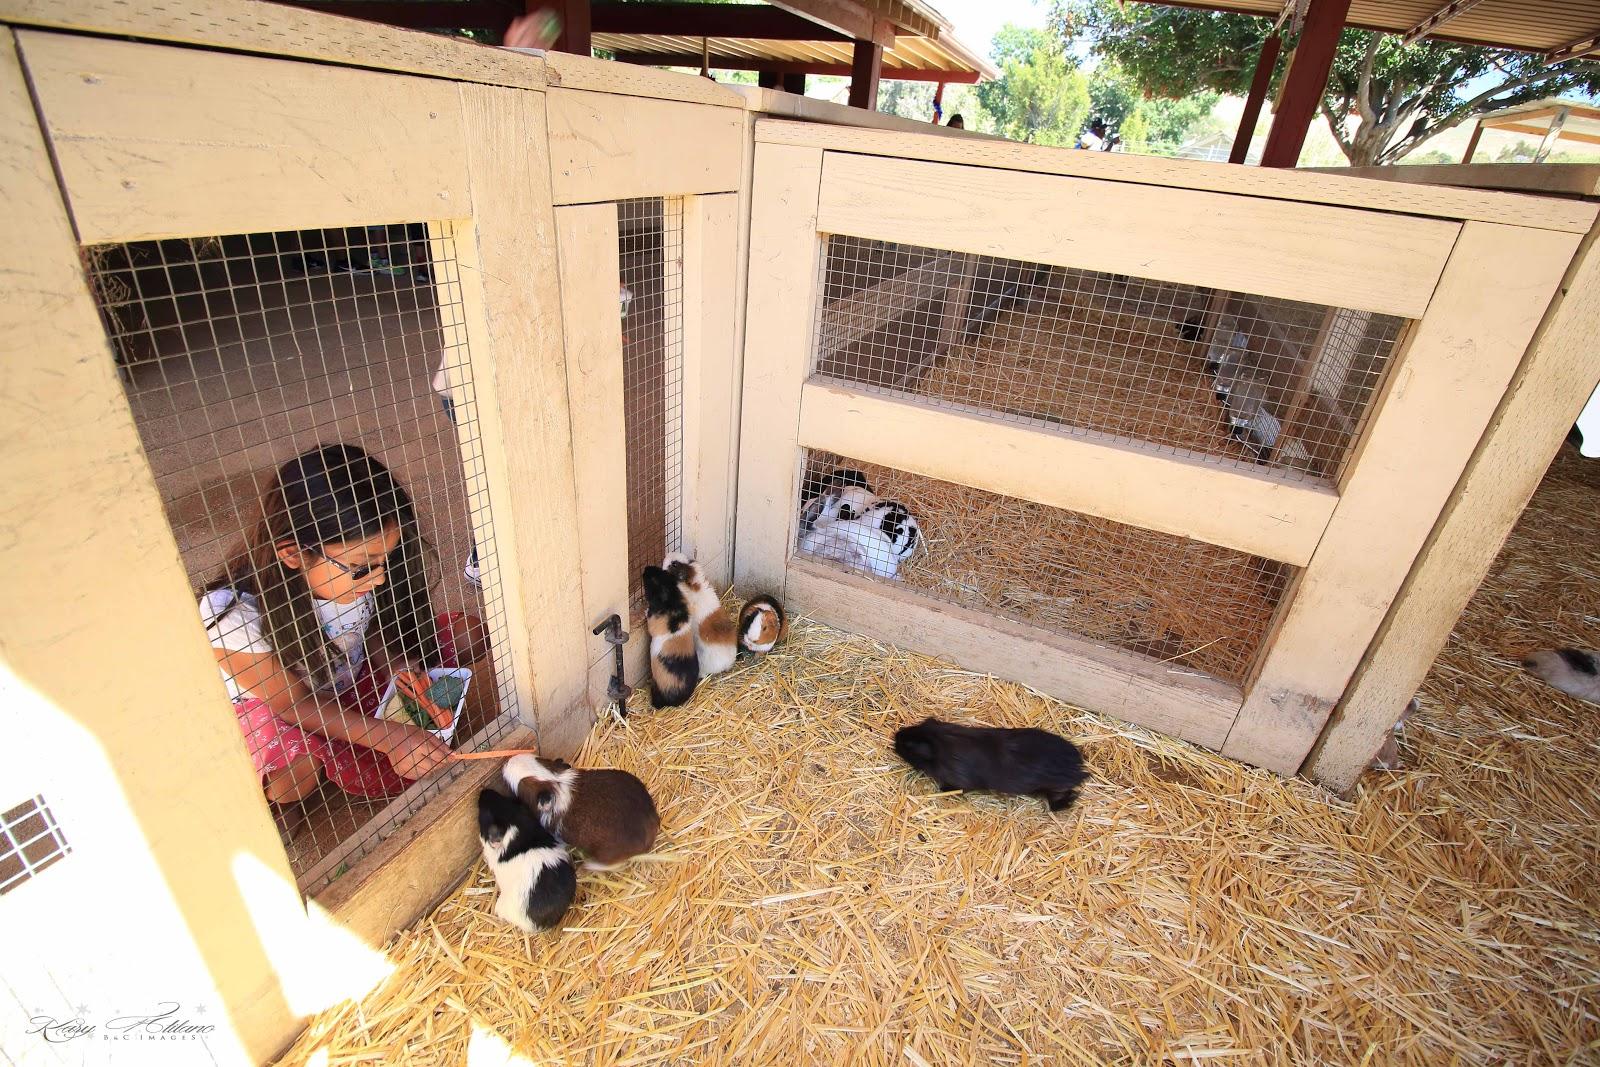 Bc Images Zoomers Petting Zoo San Juan Capistrano